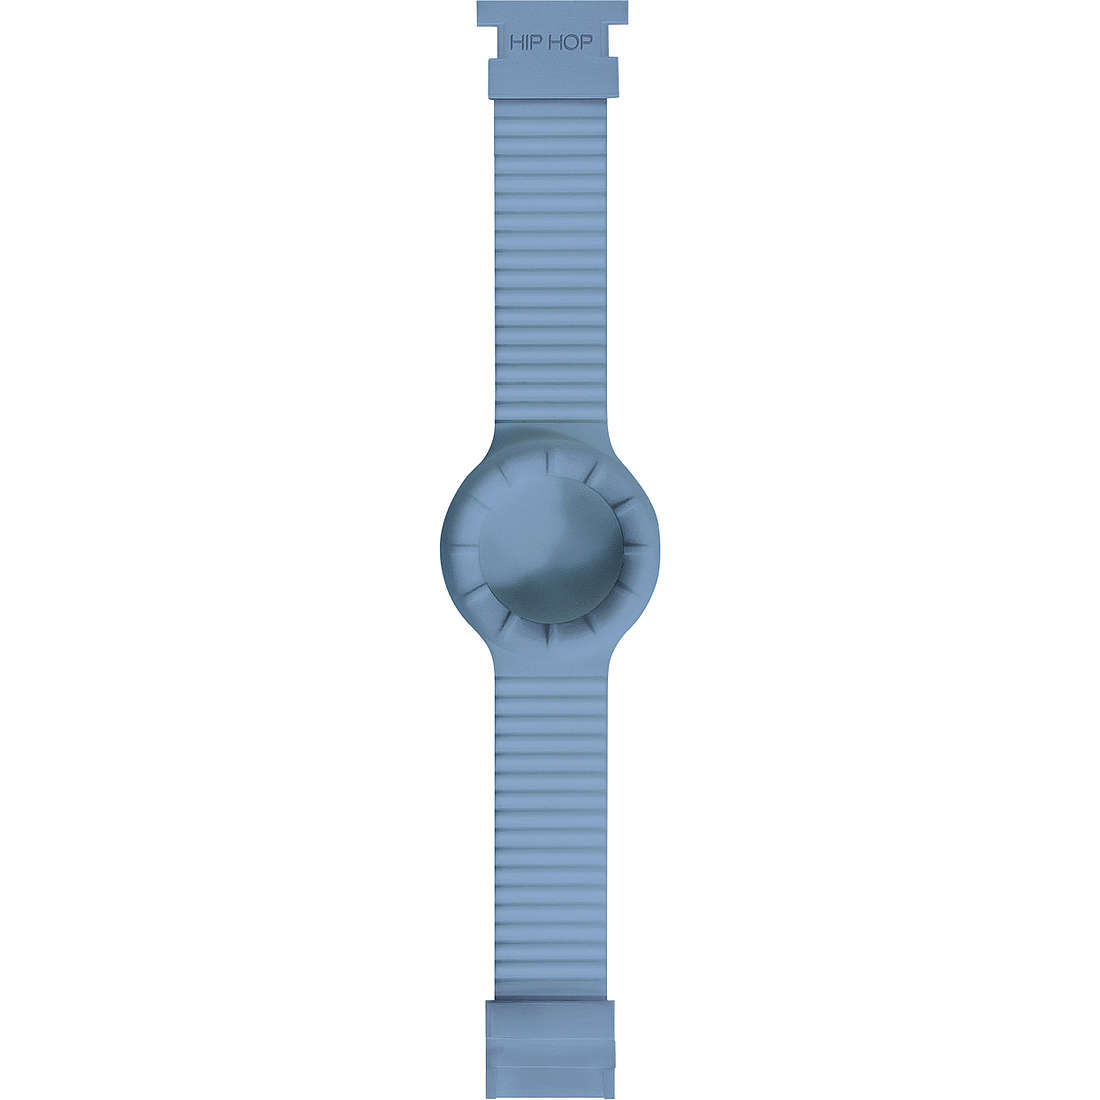 orologio accessorio unisex Hip Hop Hero HBU0234